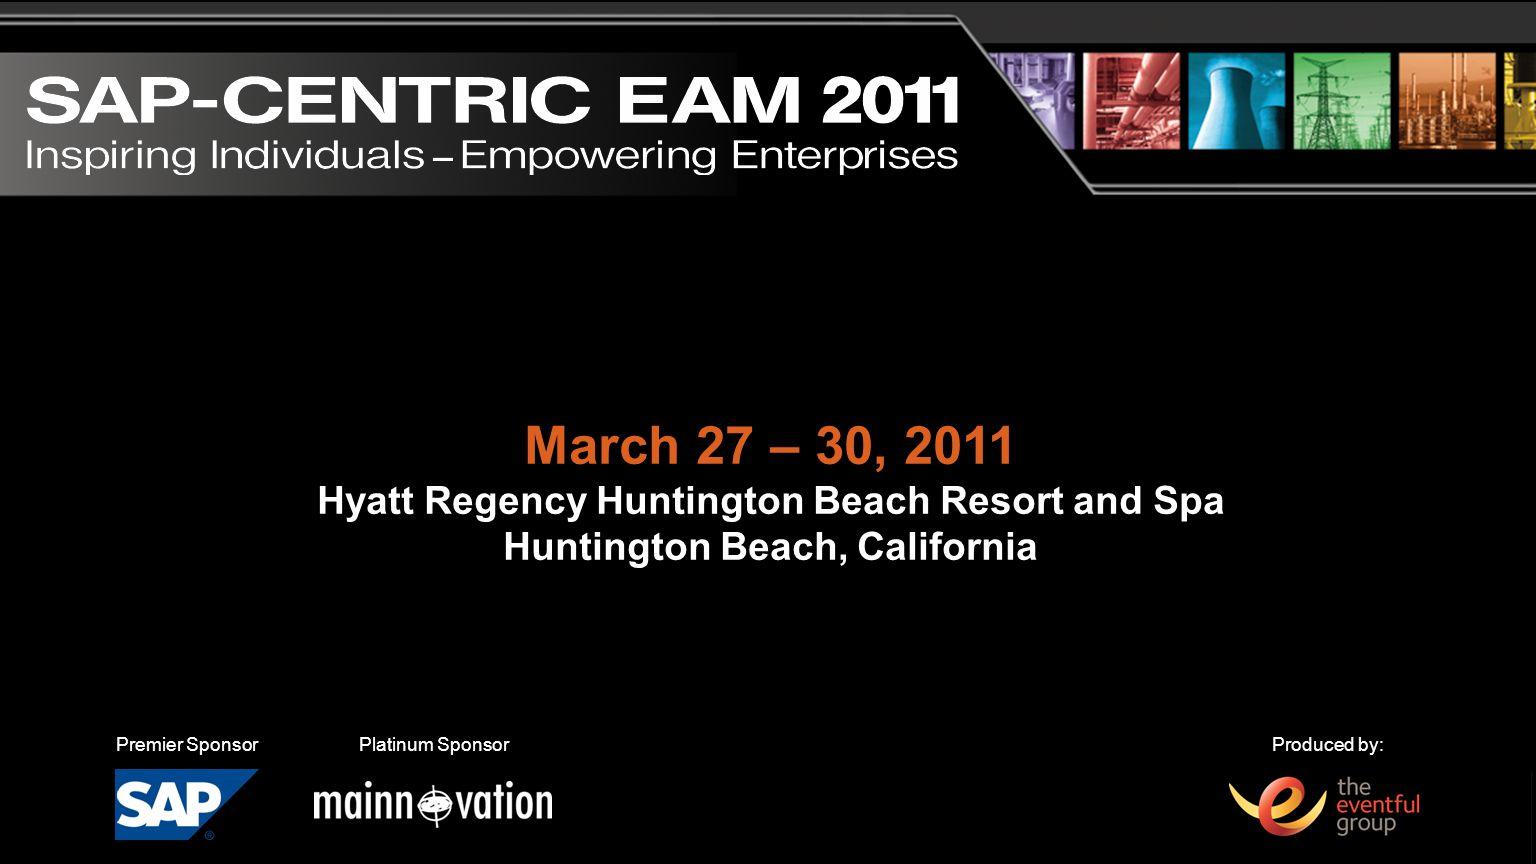 Produced by:Platinum SponsorPremier Sponsor March 27 – 30, 2011 Hyatt Regency Huntington Beach Resort and Spa Huntington Beach, California